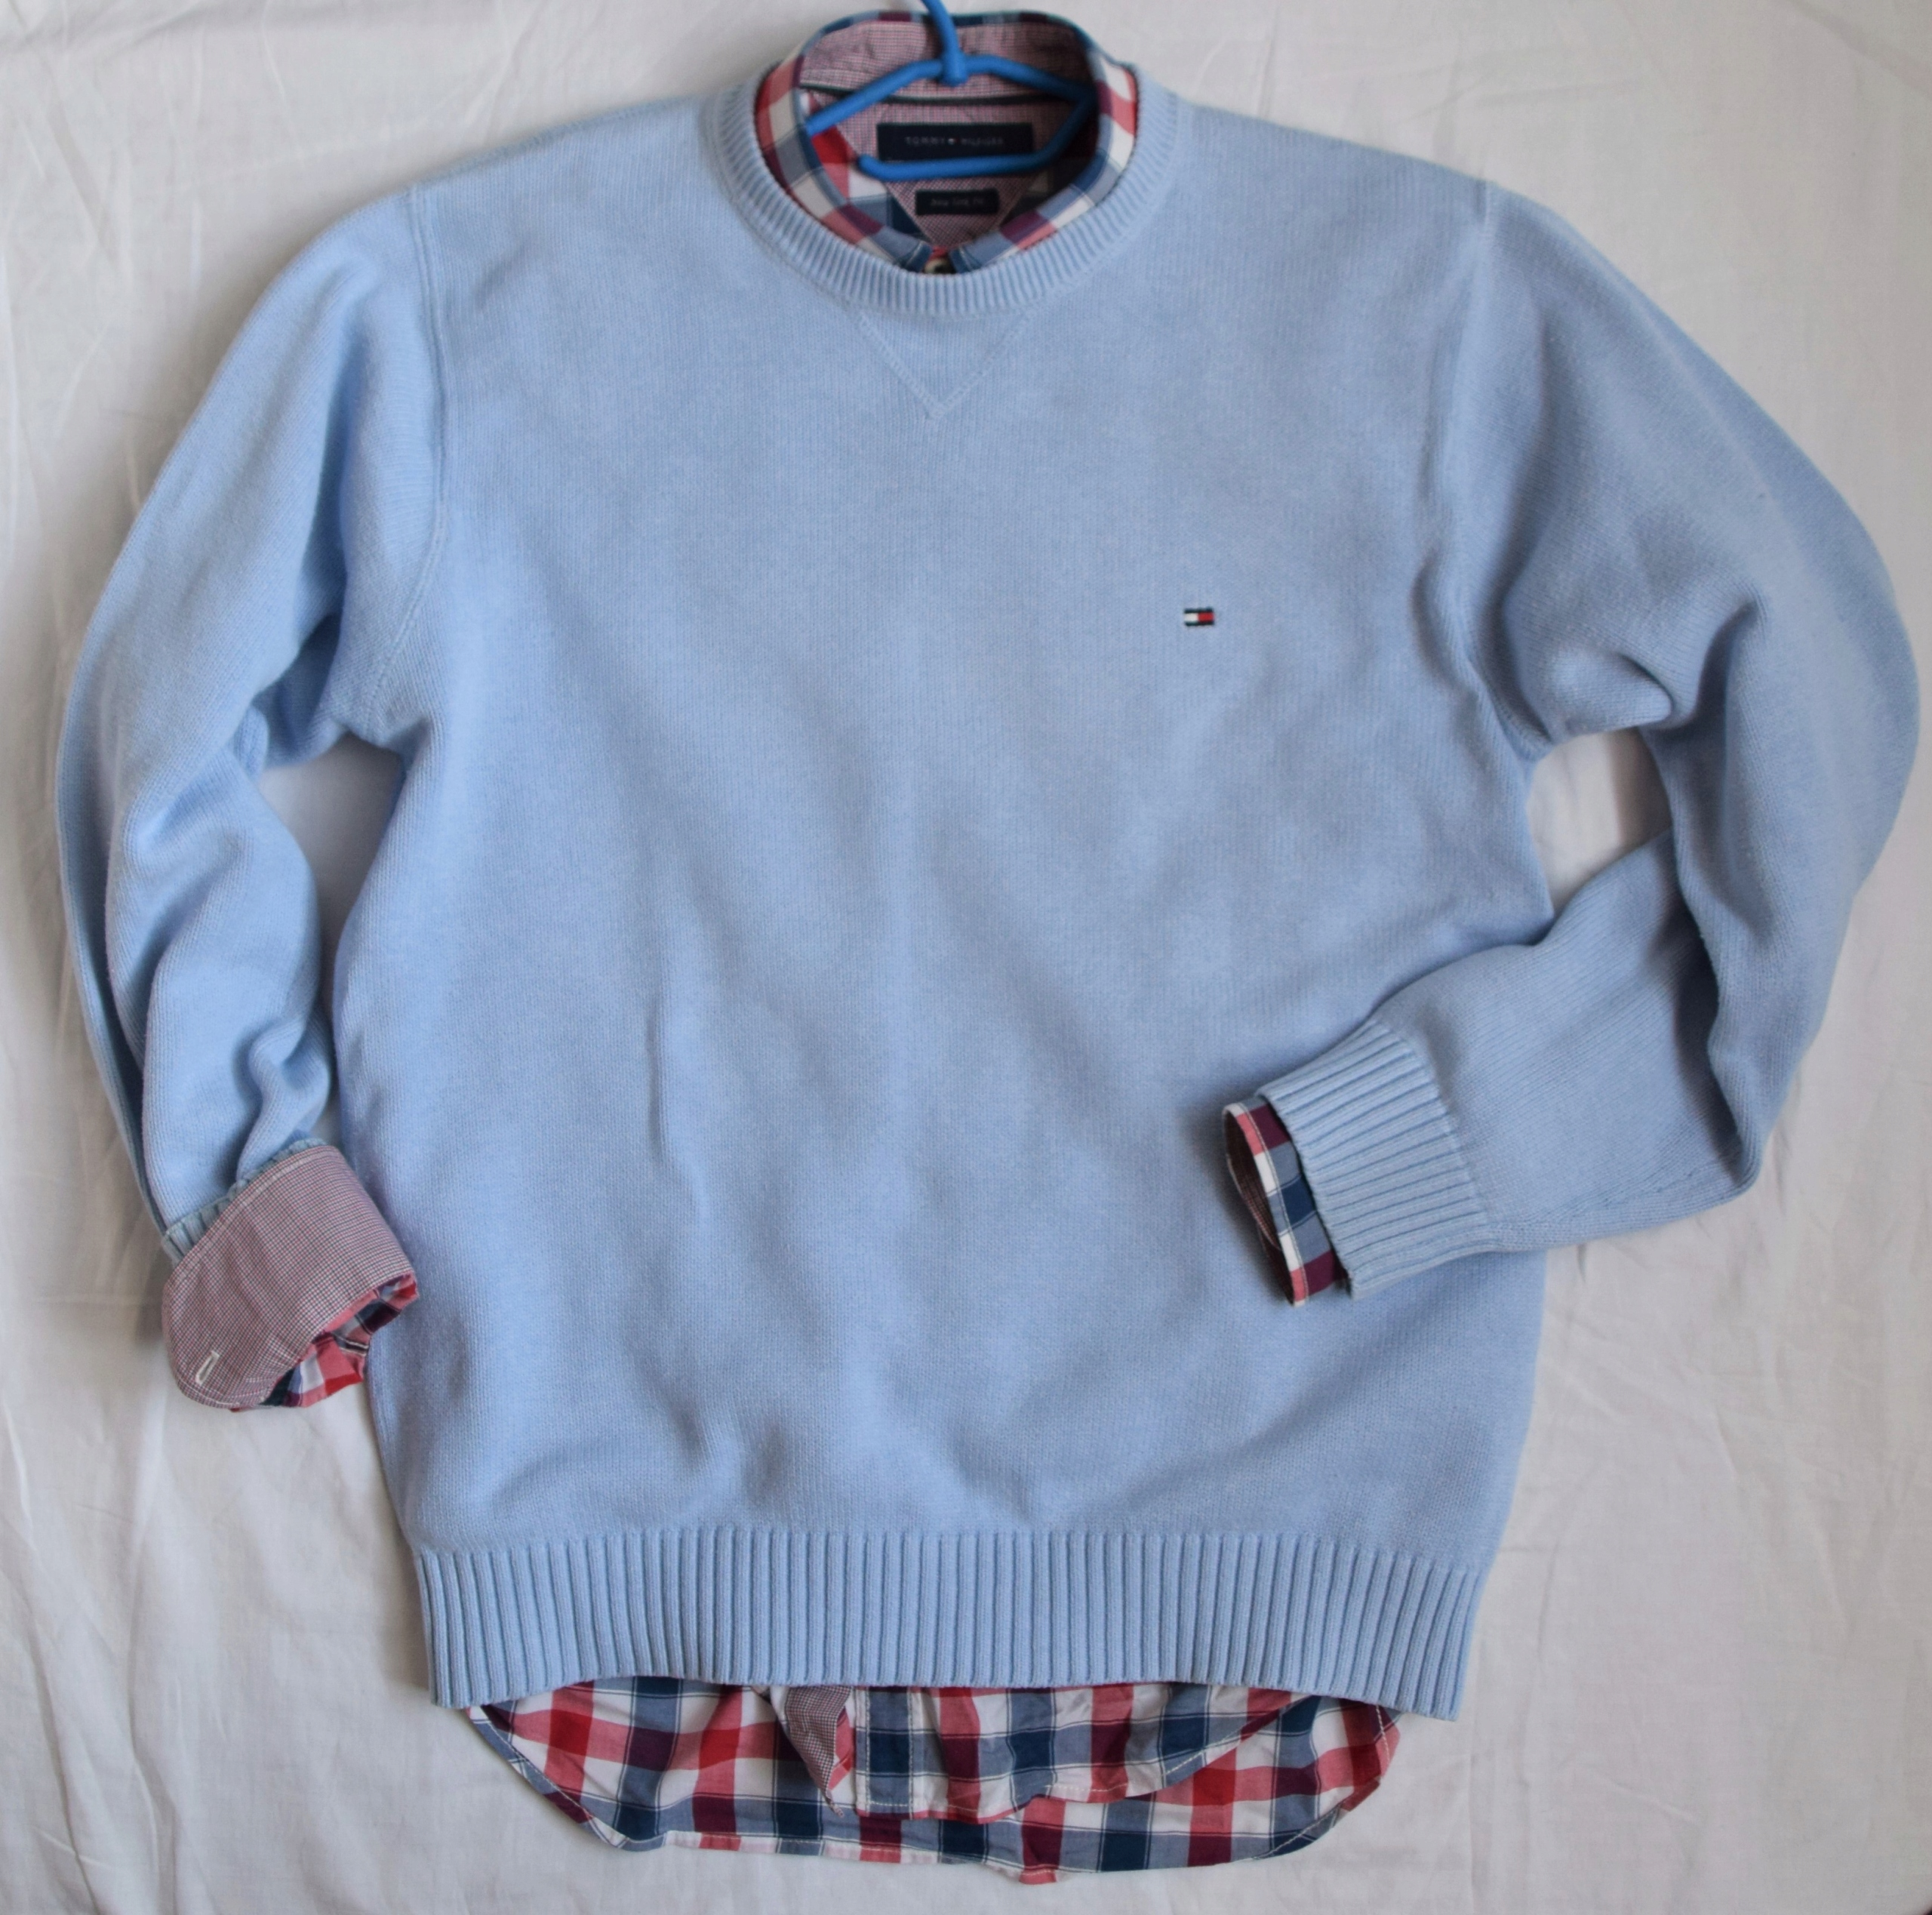 Tommy Hilfiger sweterek błękit 100% bawełna M